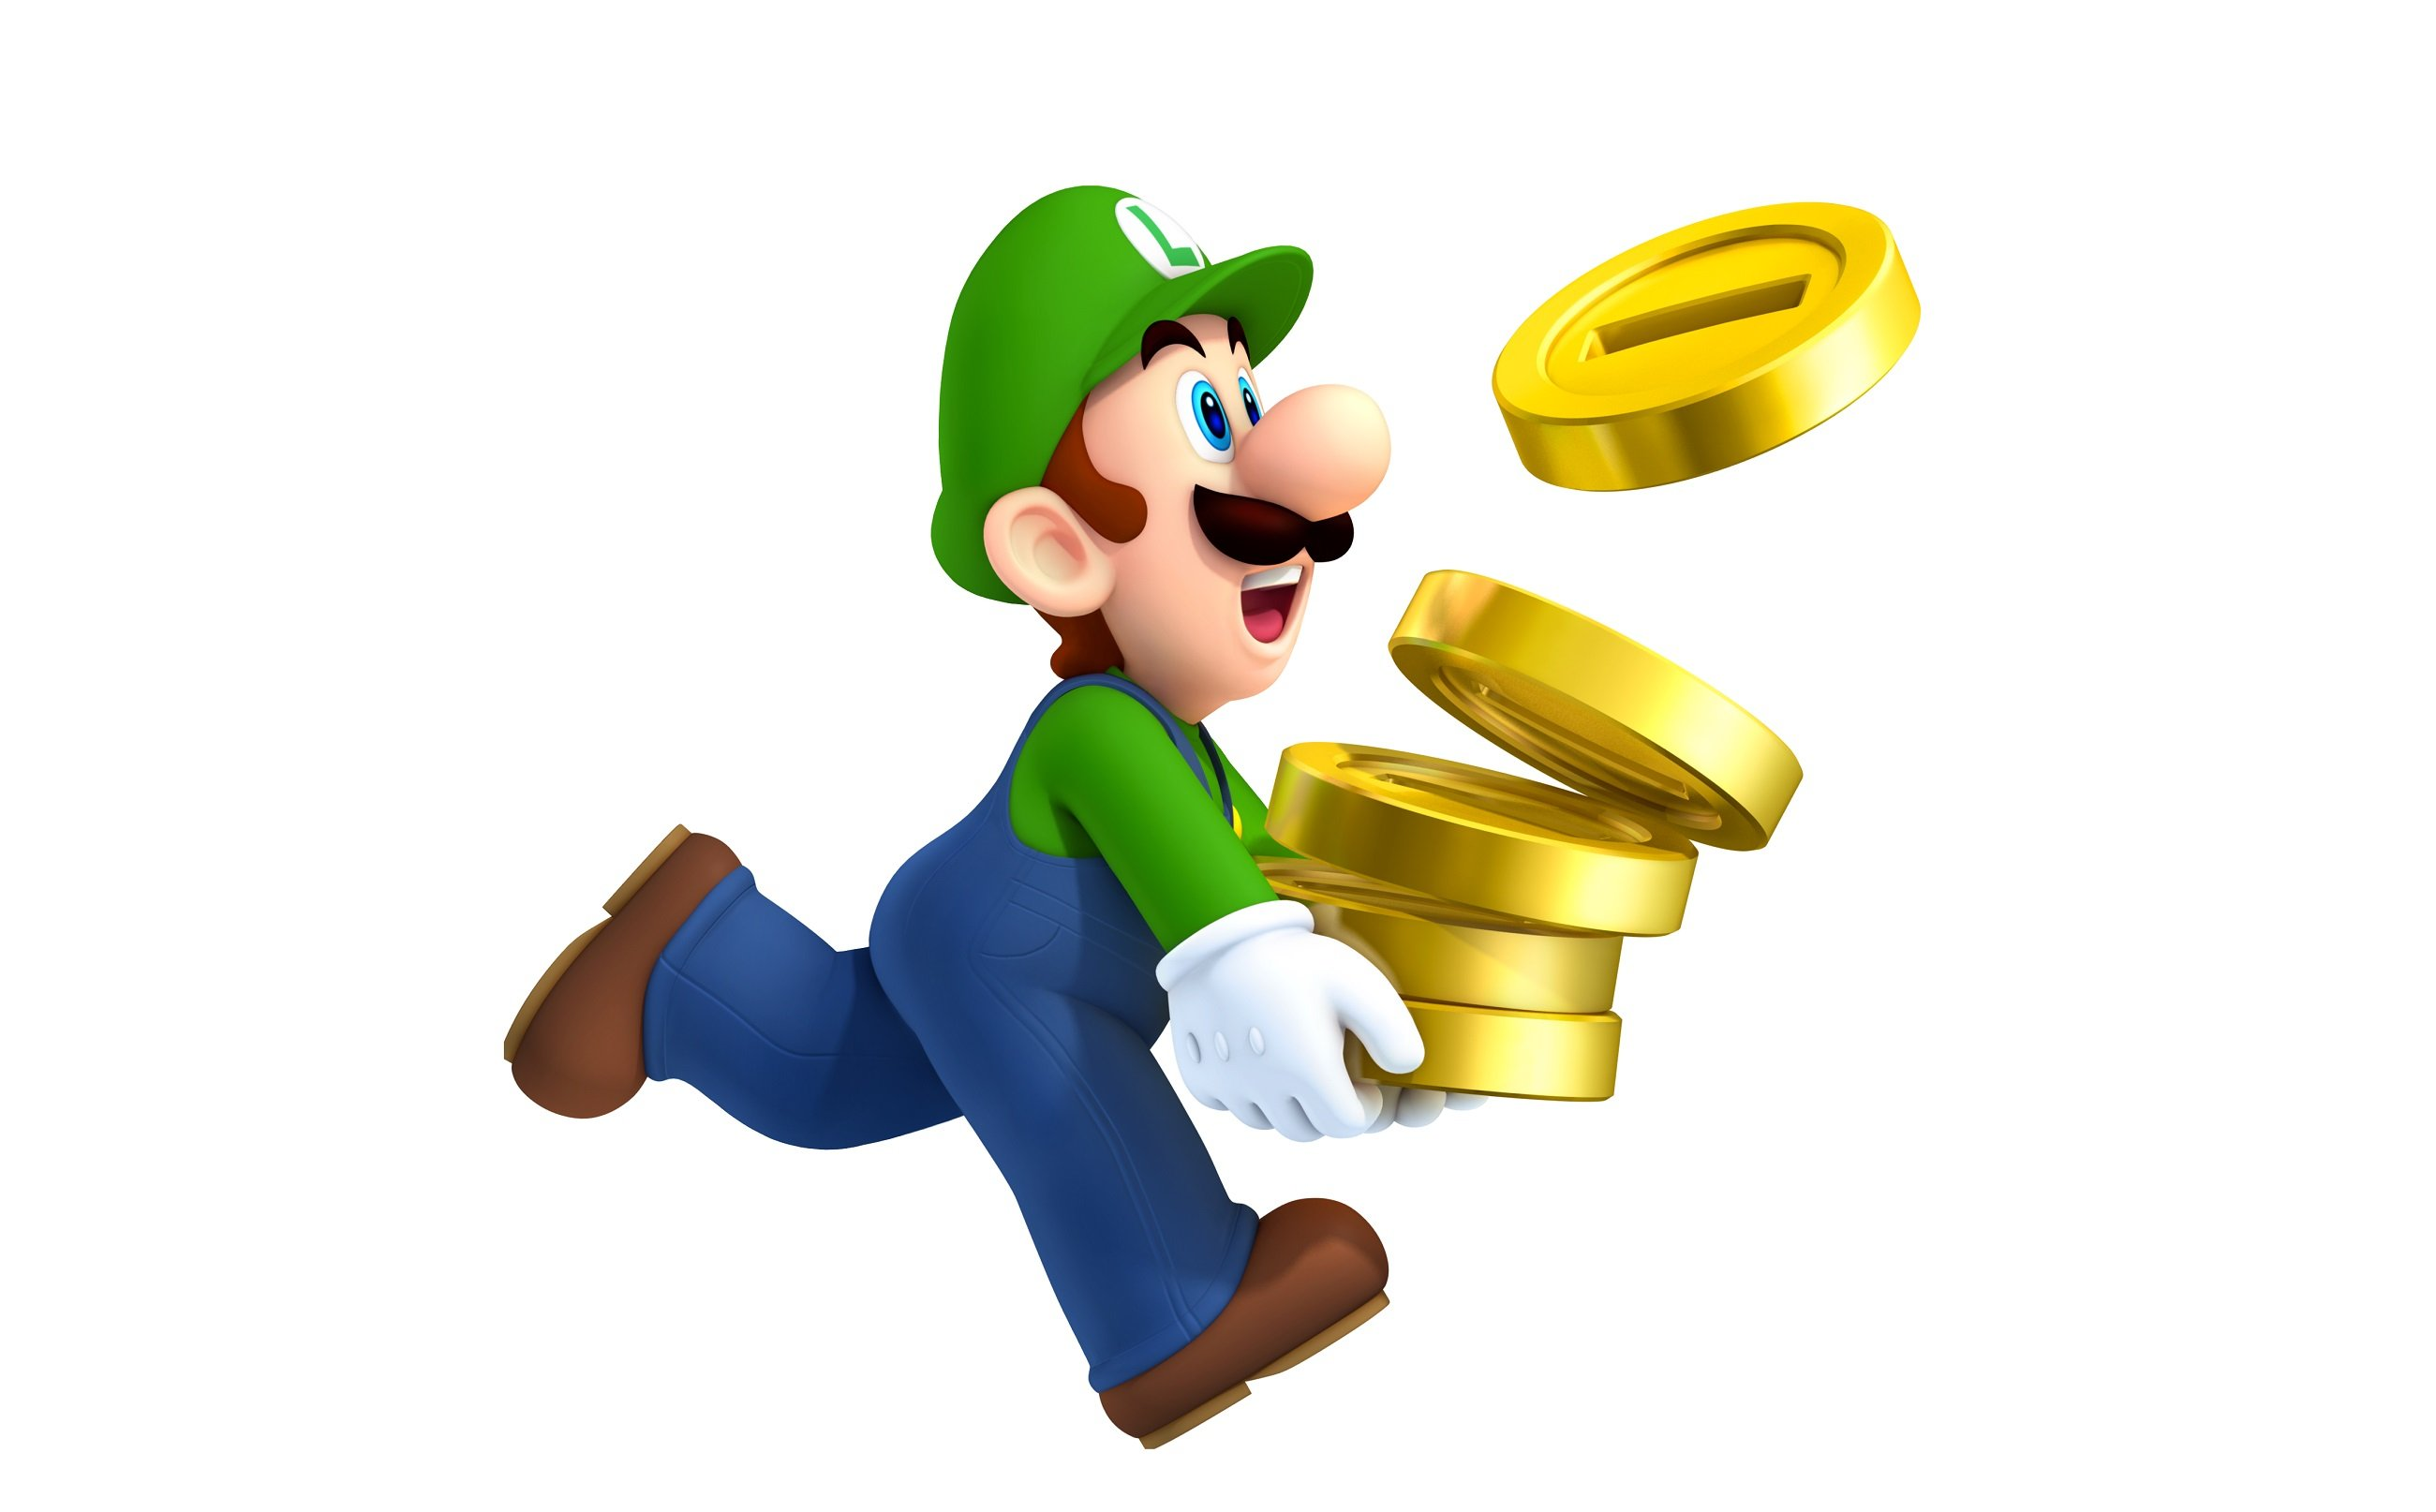 Shigeru Miyamoto de Nintendo parle contre les microtransactions gratuites